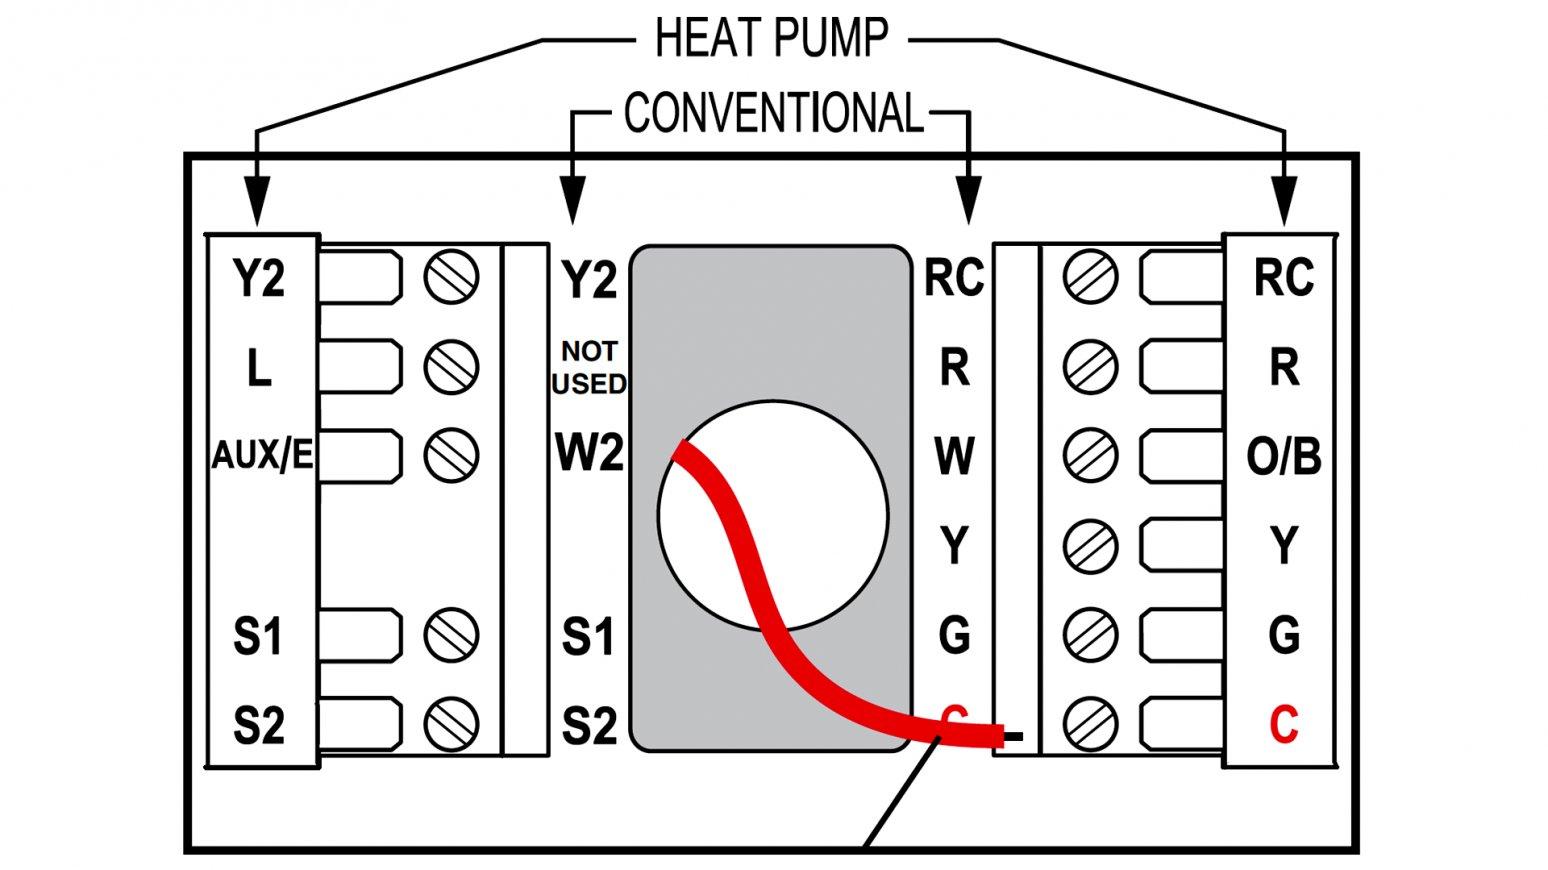 T834N Honeywell Thermostat Wiring Diagram - Wiring Diagram Schema - Gas Furnace Thermostat Wiring Diagram